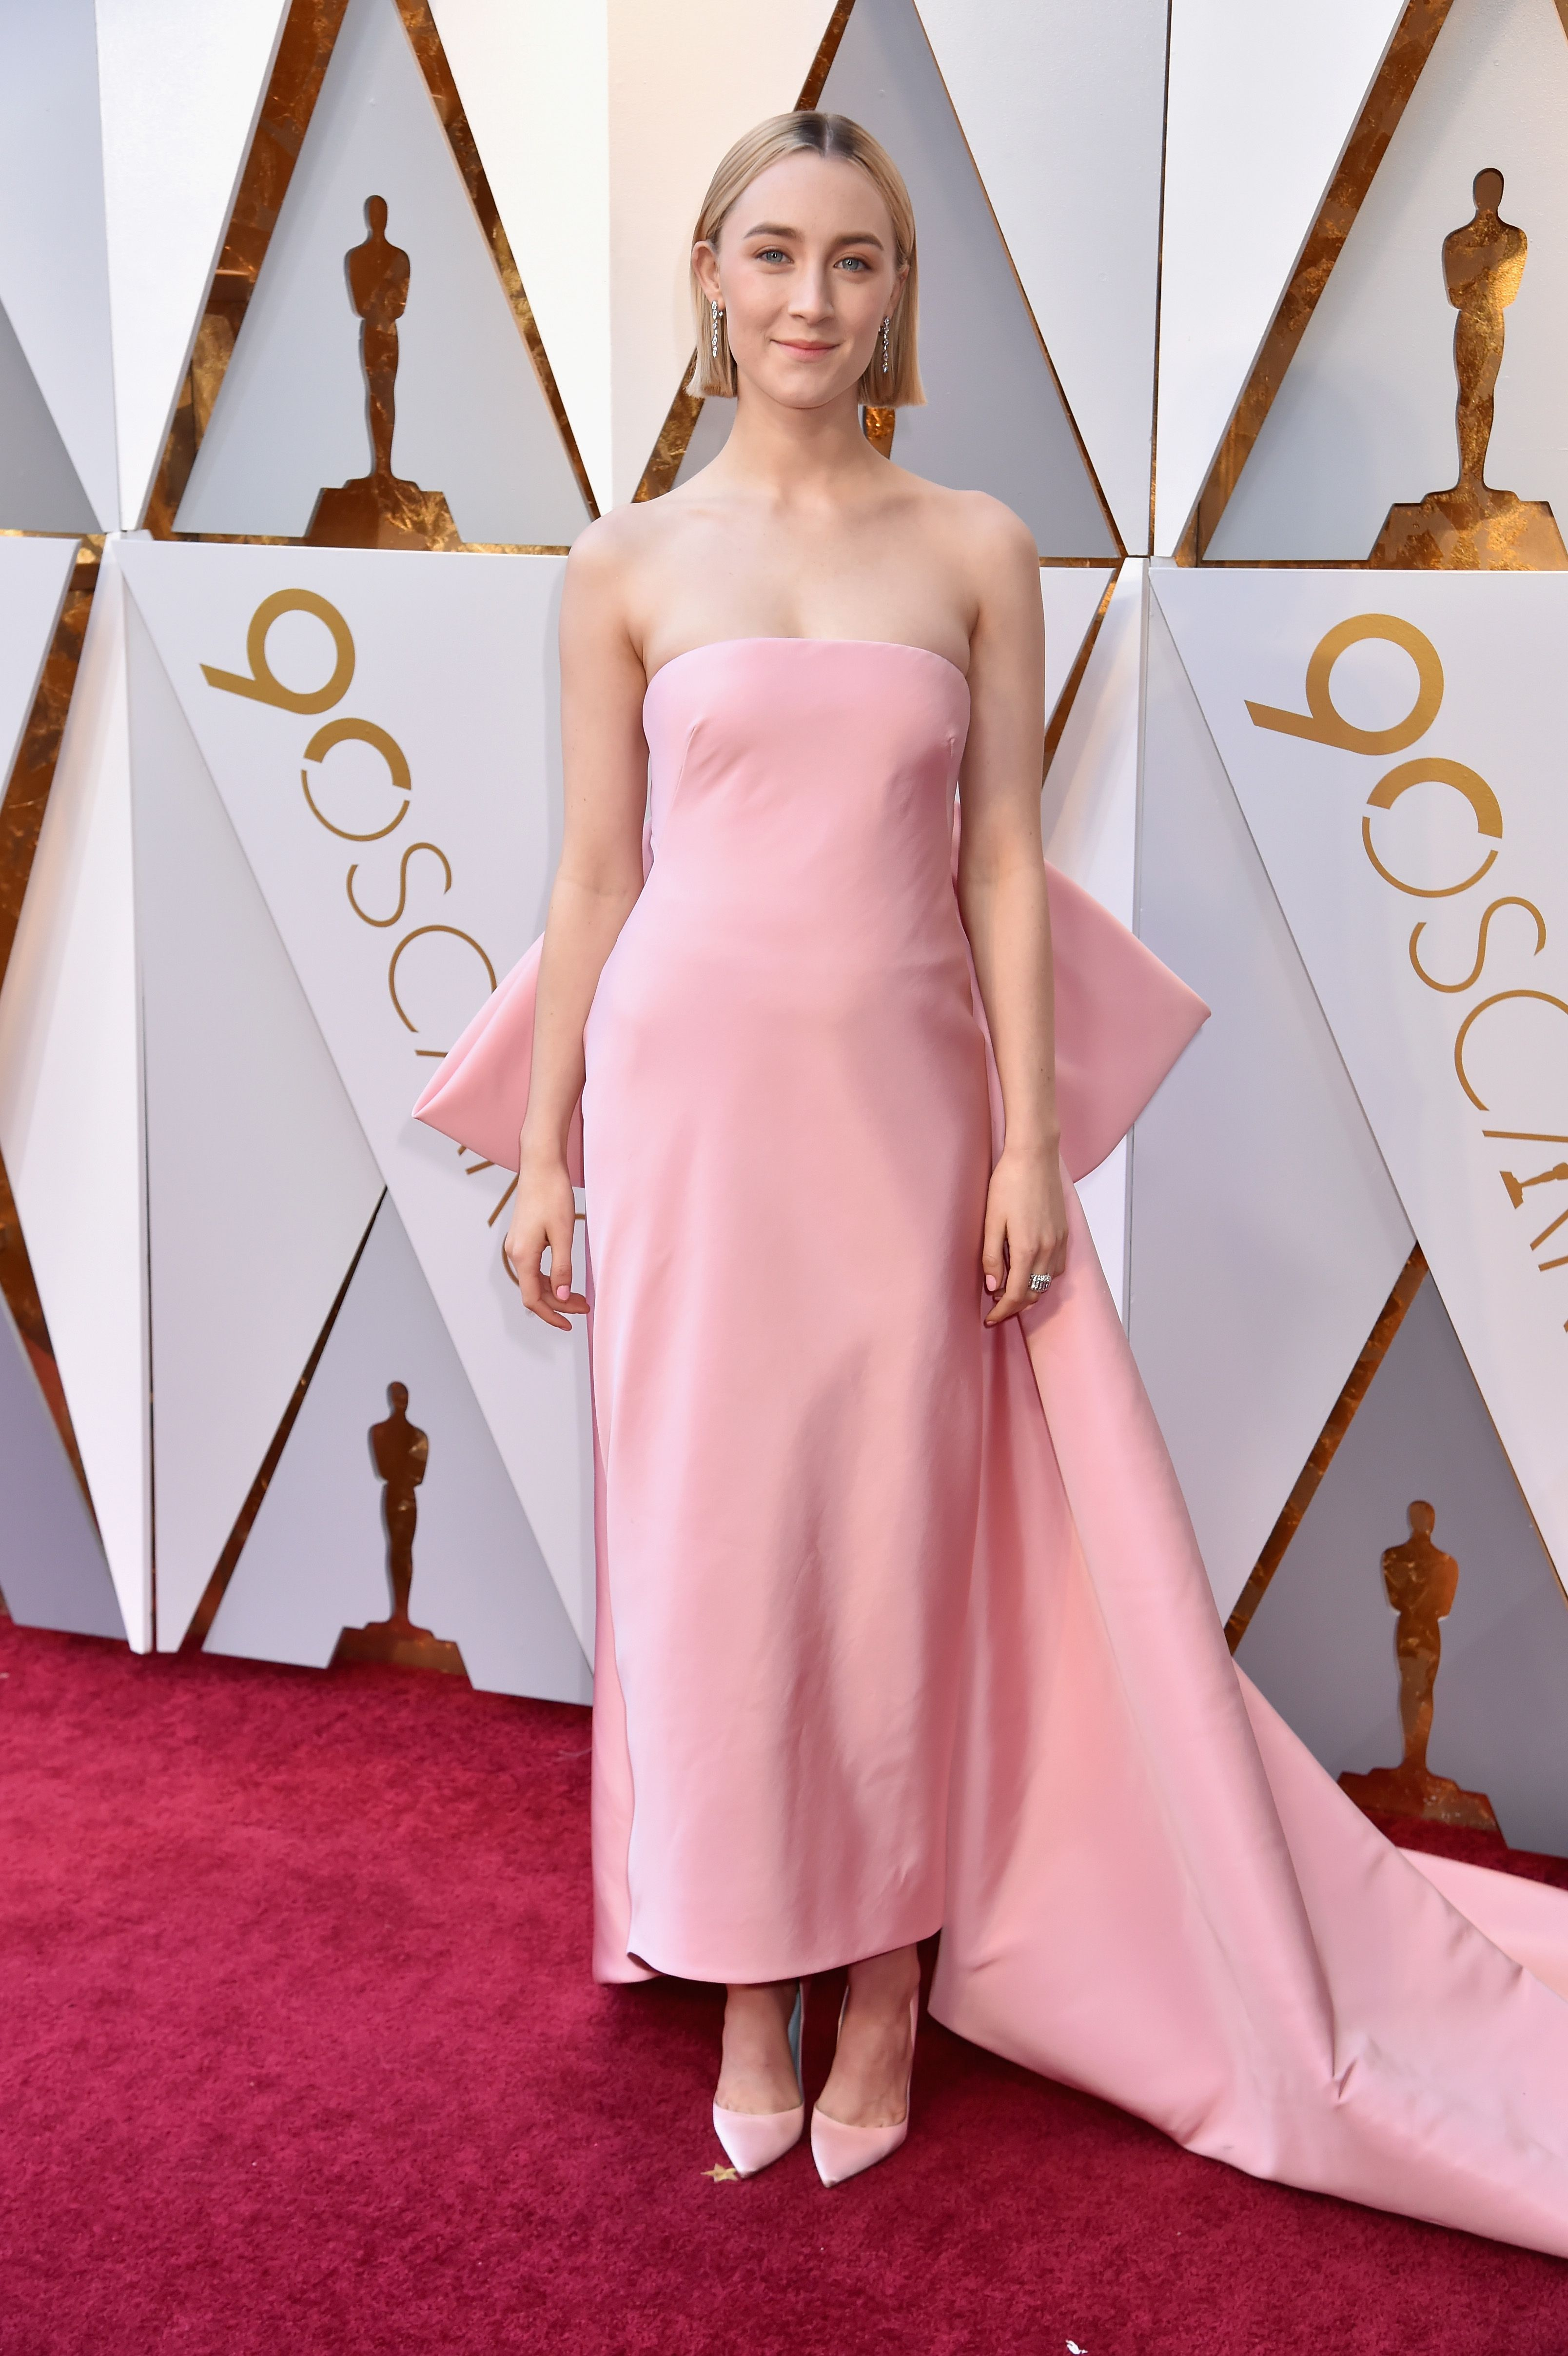 All Oscars 2018 Red Carpet Dresses - Every Academy Awards Celebrity Look d5d5d6593